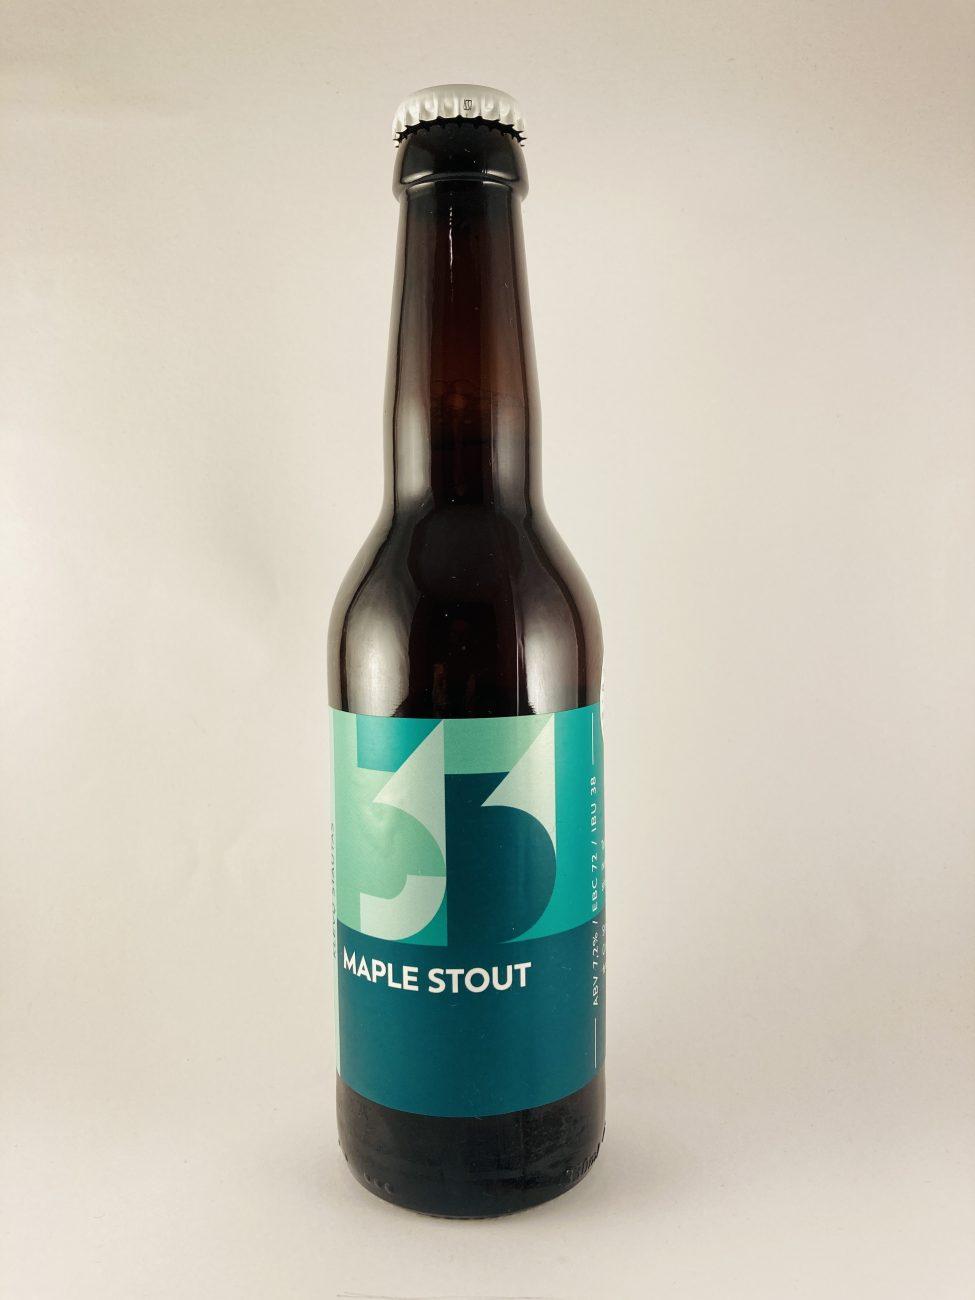 Maple-Stout-sakiskes-brewery-craft